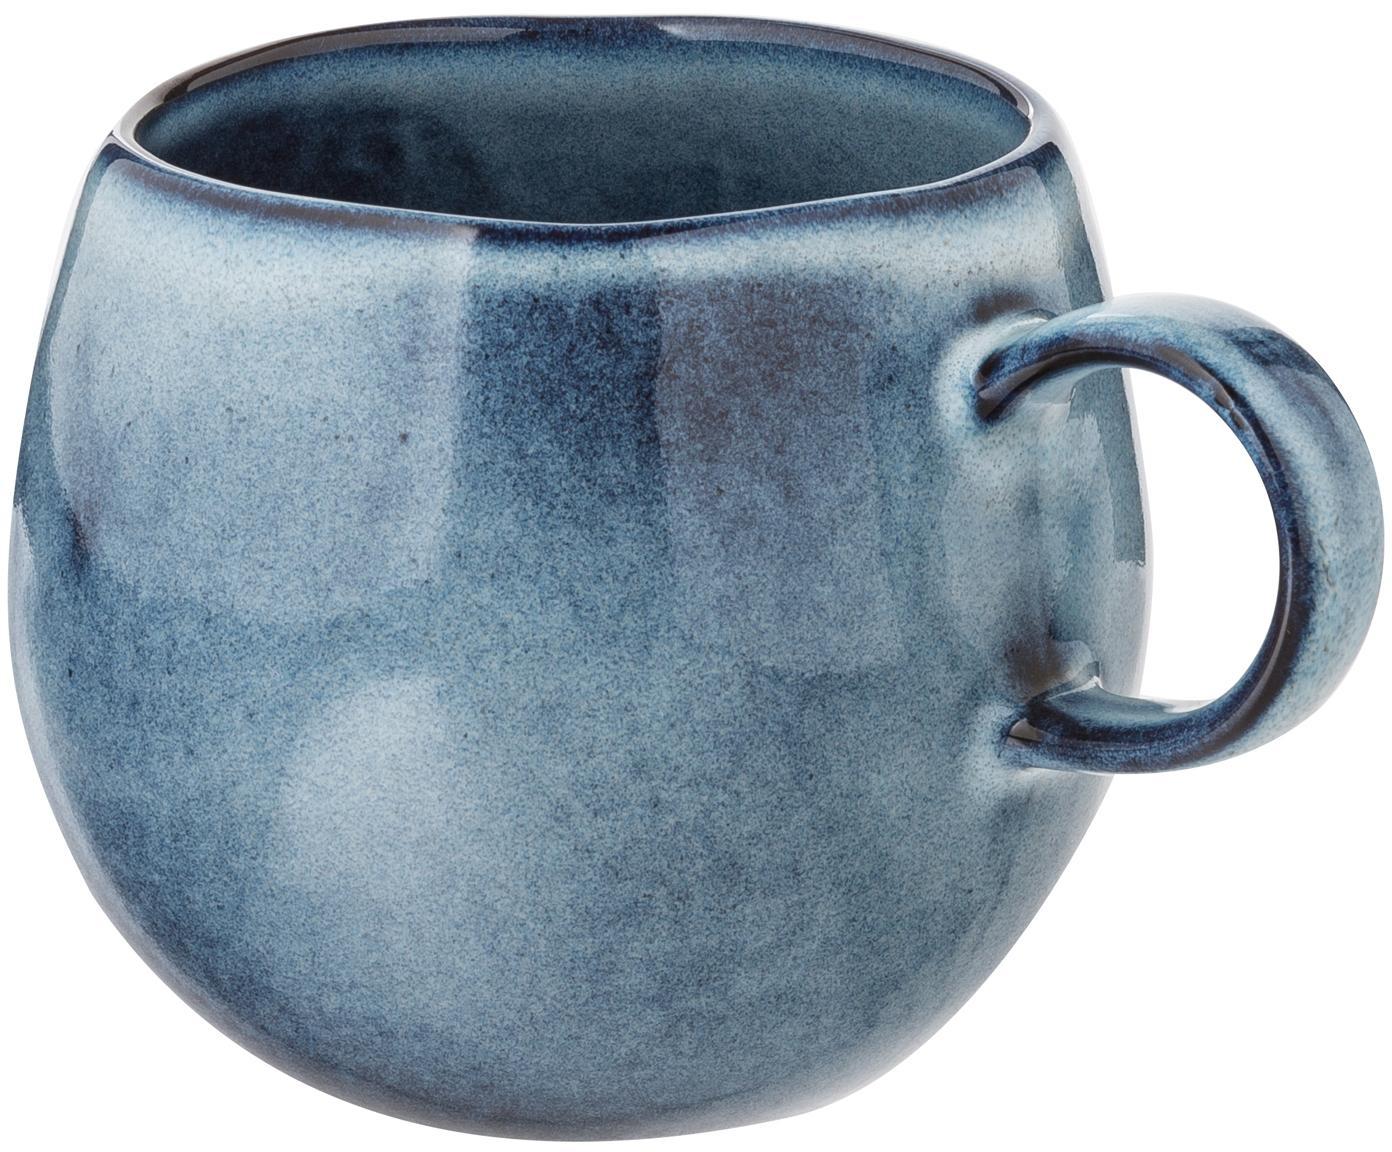 Taza artesanal Sandrine, Cerámica, Azul, Ø 10 x Al 10 cm